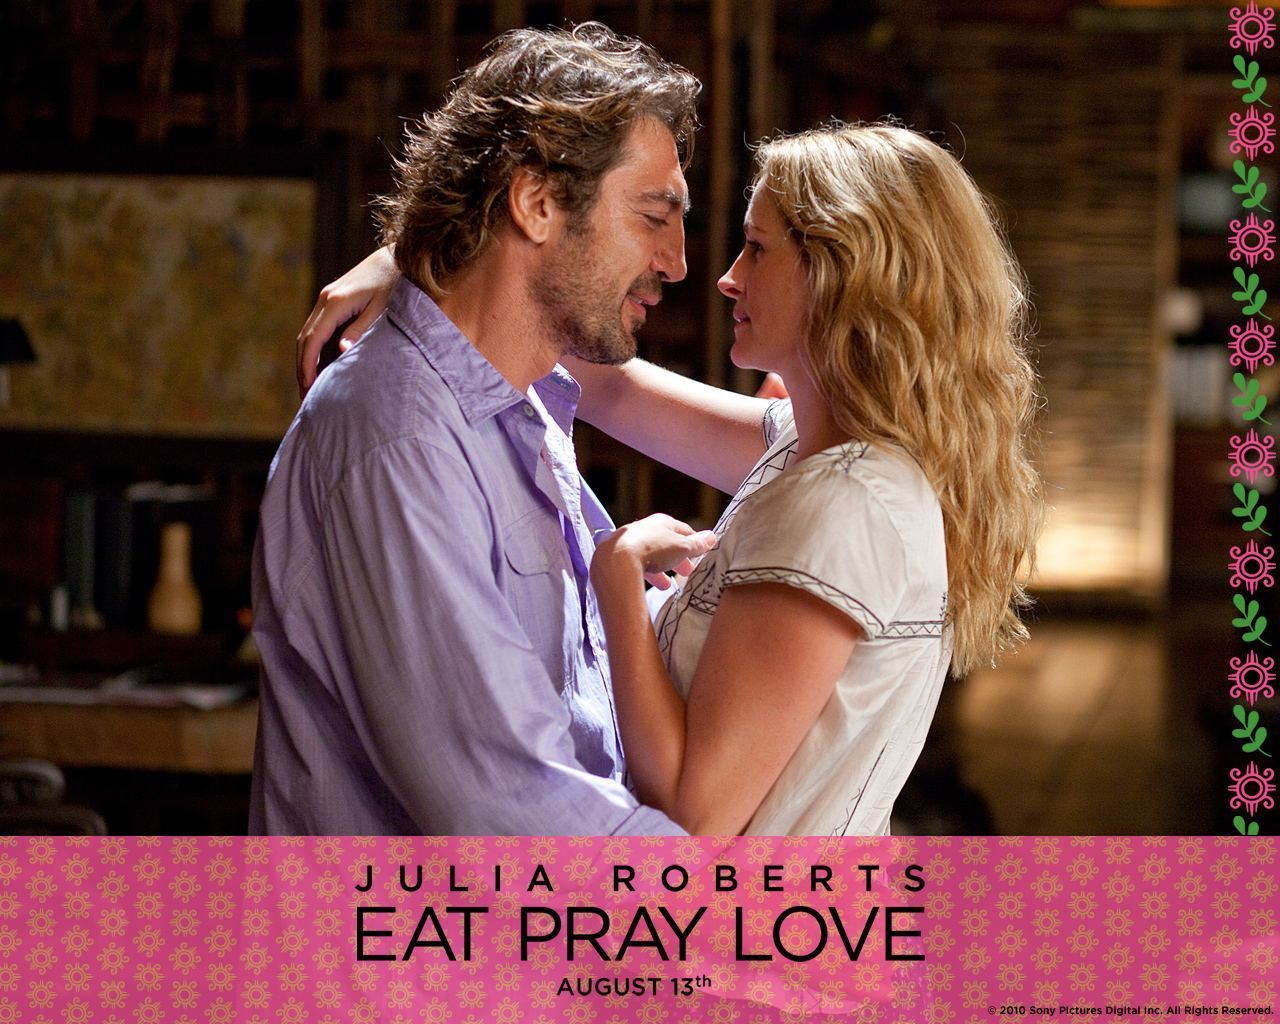 Love Wallpaper Movie : EPL Movie Wallpaper - Eat Pray Love Wallpaper (14039002) - Fanpop